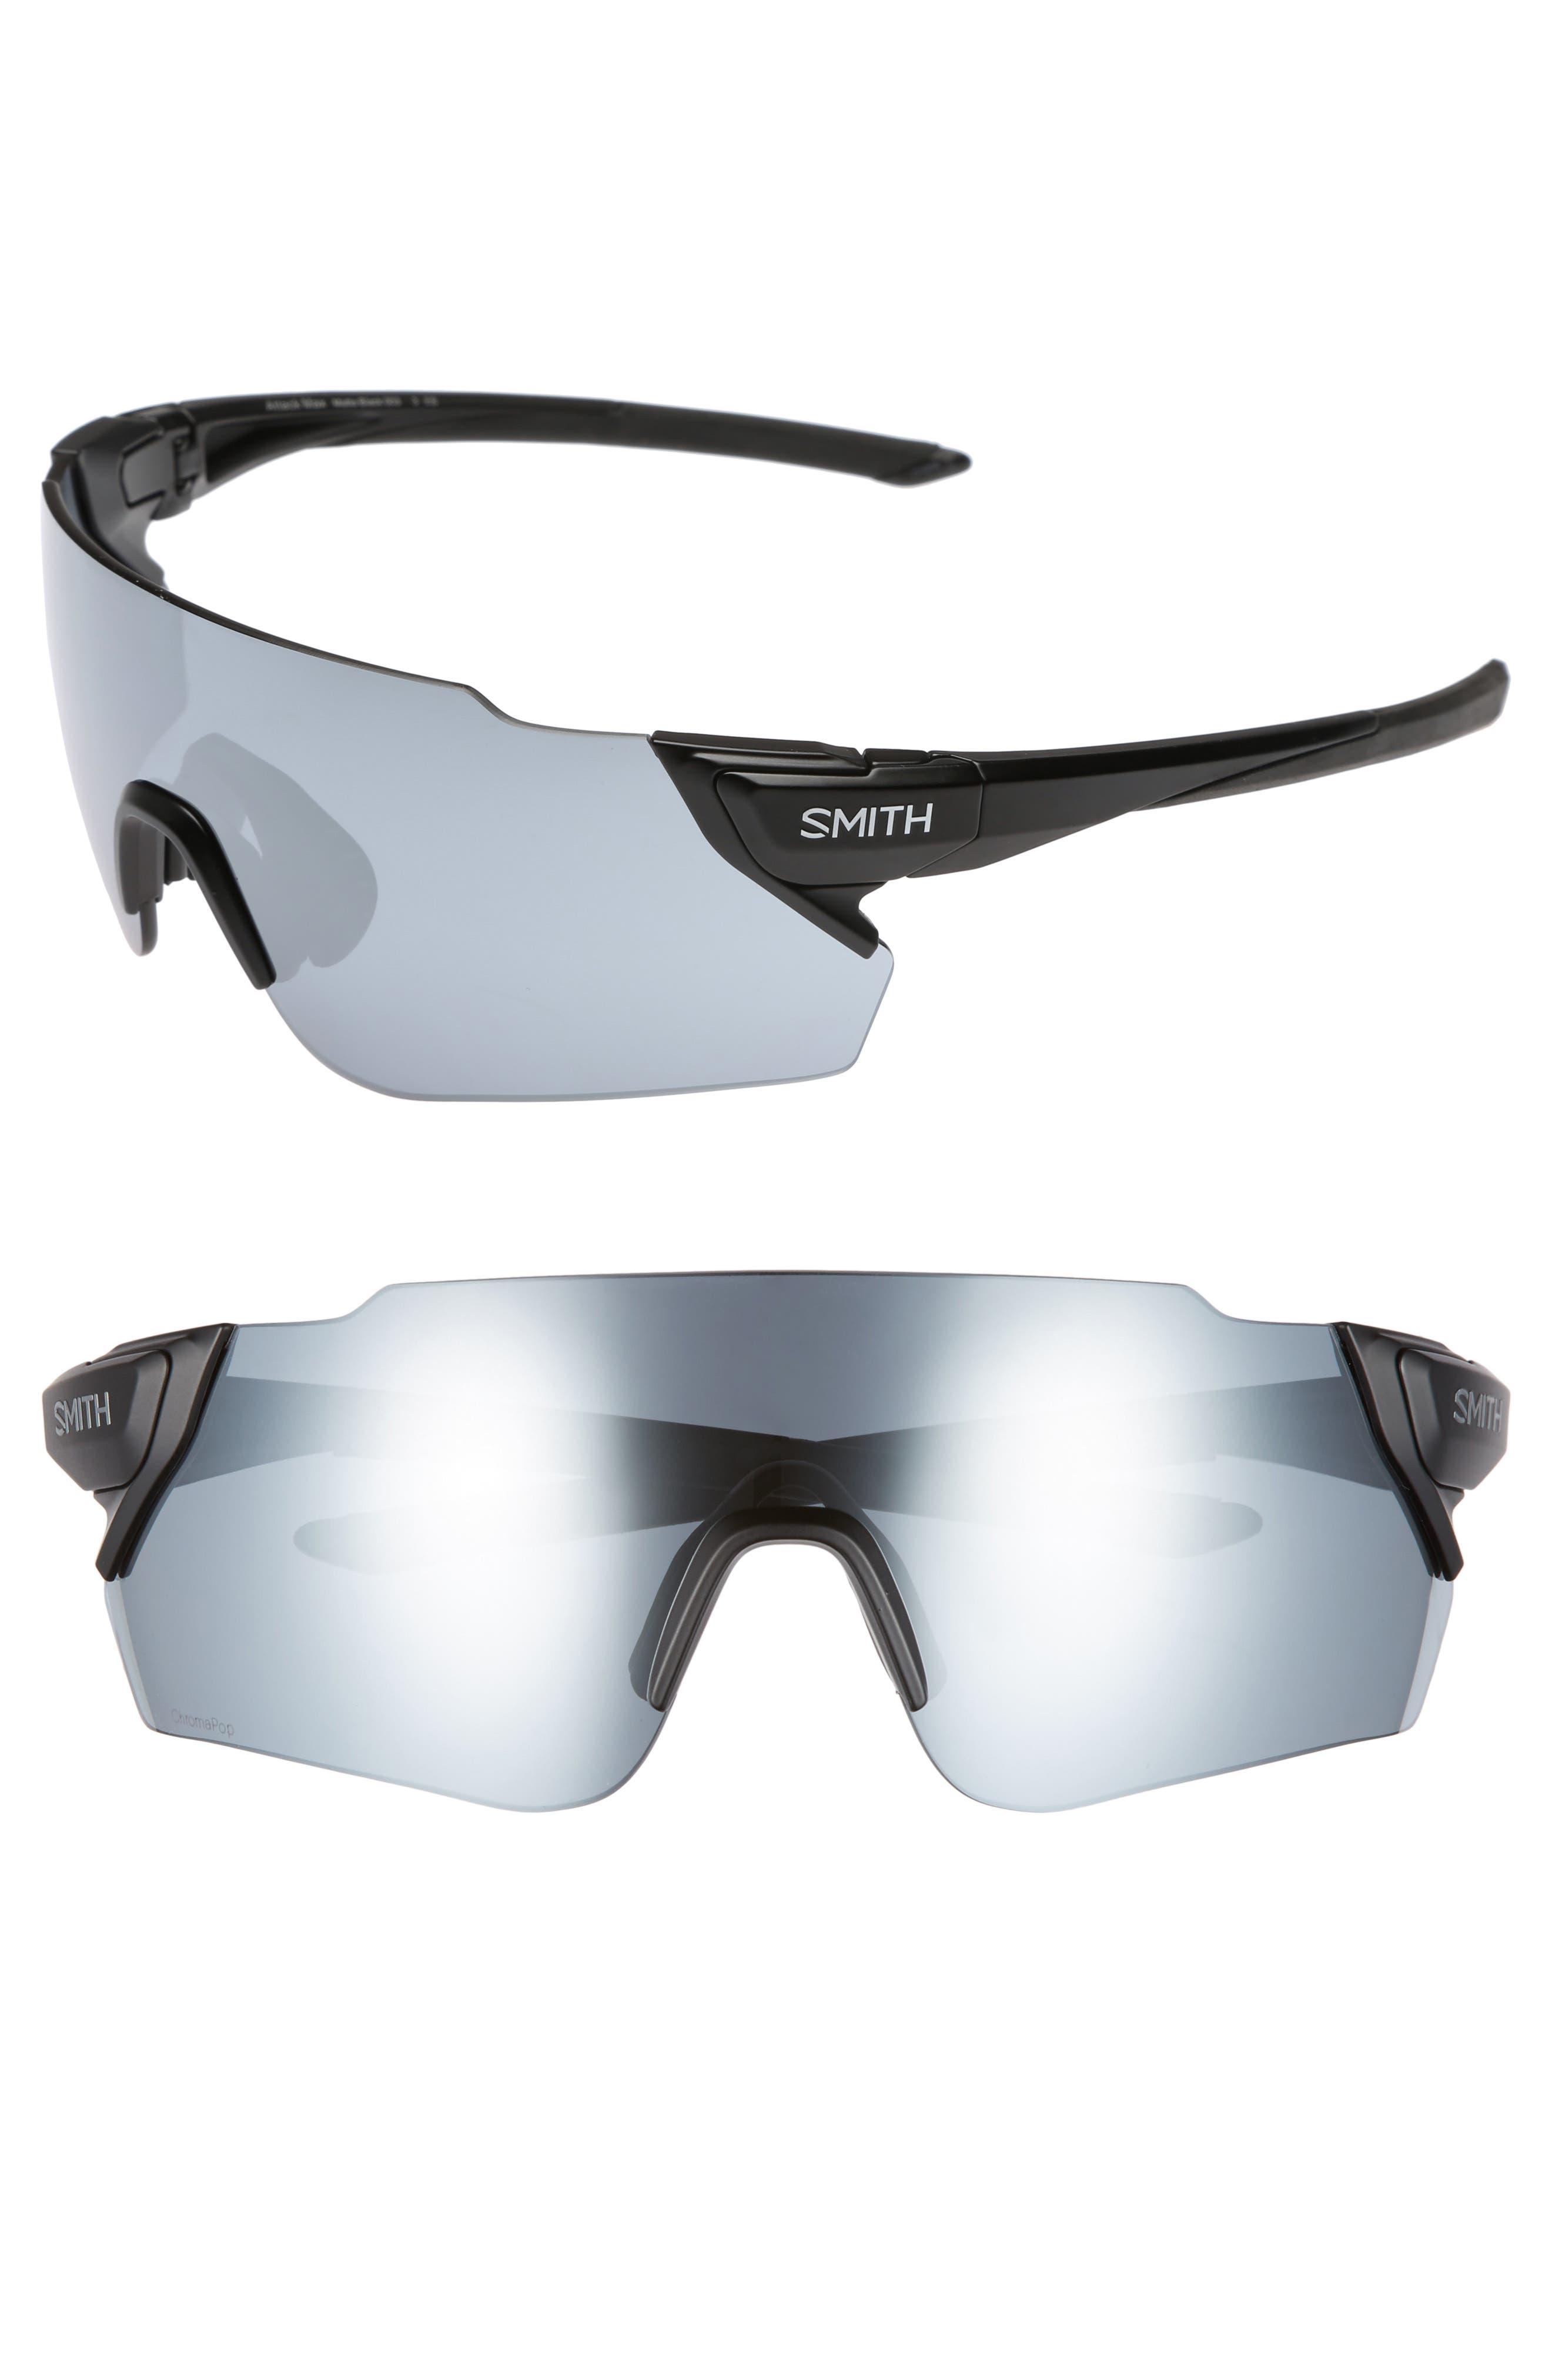 Attack Max 125mm ChromaPop<sup>™</sup> Polarized Shield Sunglasses,                         Main,                         color, 002